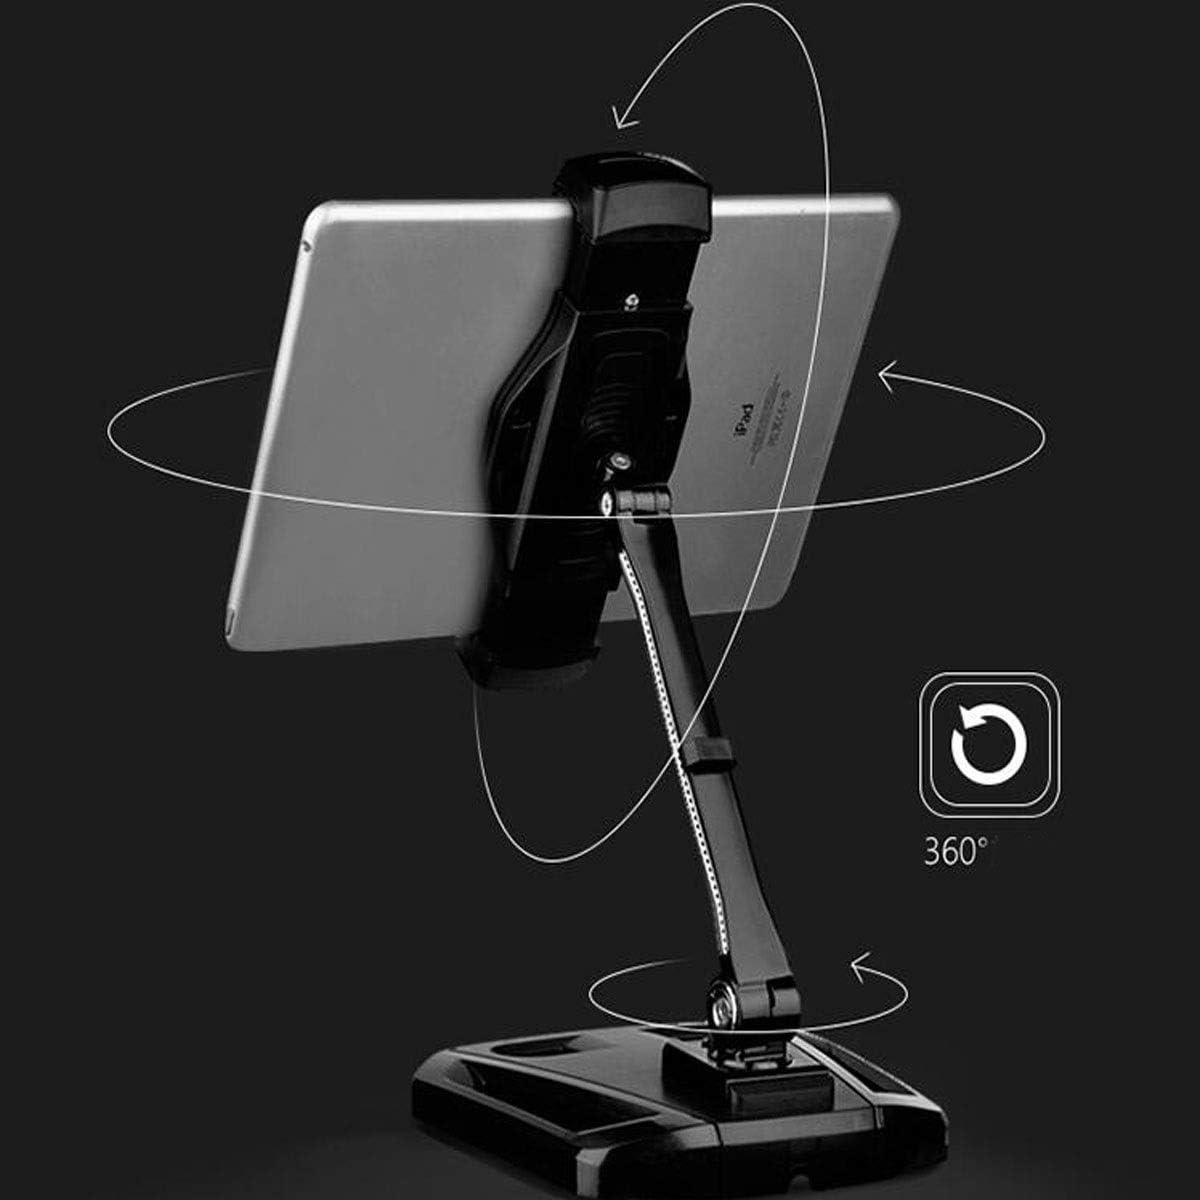 Living Room Aishanghuayi Mobile Phone Holder Suitable For Car Charging And Non-slip Mobile Phone Holder Adjustable Aluminum Desktop Phone Tablet Holder Mobile Phone Bedroom Bedside Tabletop Blac